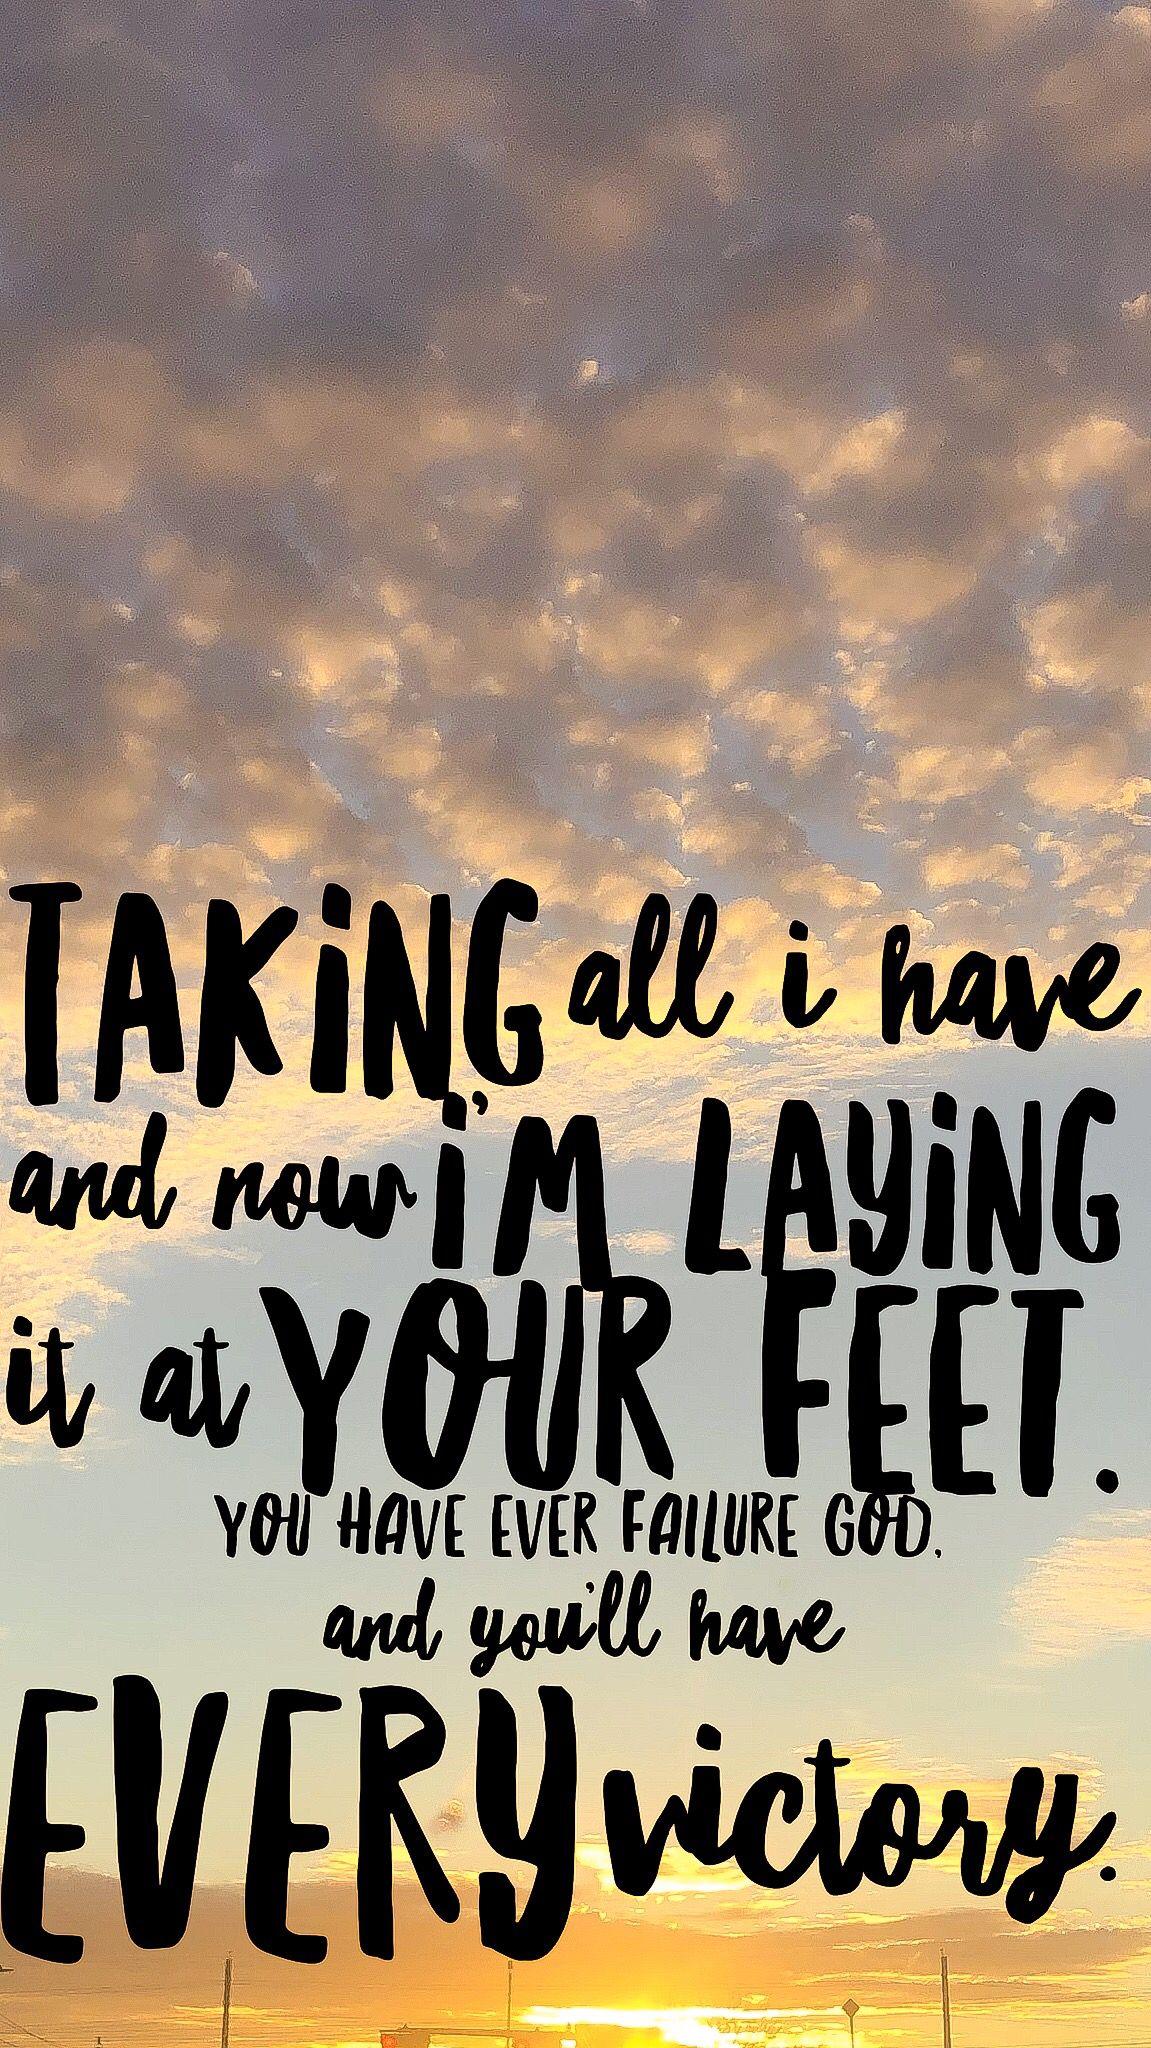 Lauren Daigle you say lyrics 💛 | Christian song quotes ...